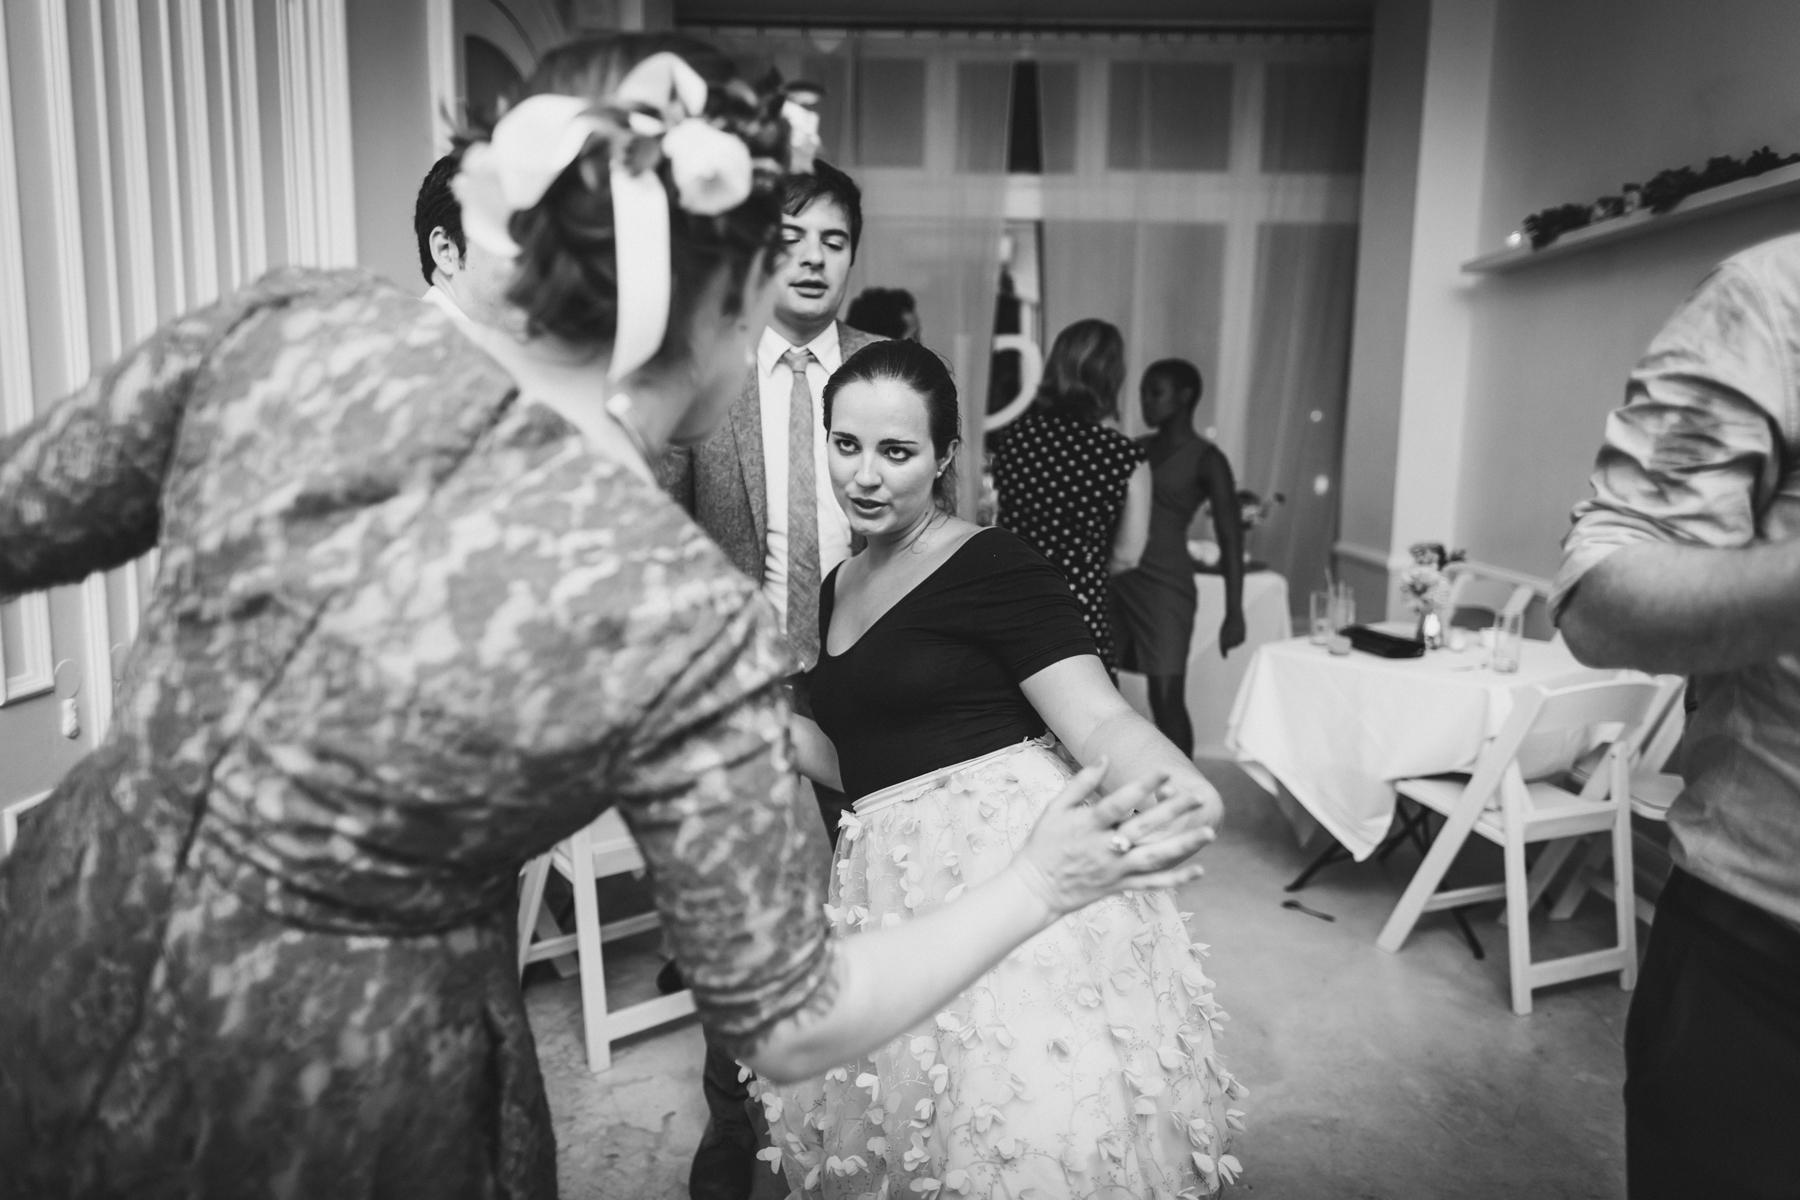 ICI-Restaurant-Fort-Greene-Brooklyn-Intimate-Documentary-Wedding-Photography-Elvira-Kalviste-105.jpg